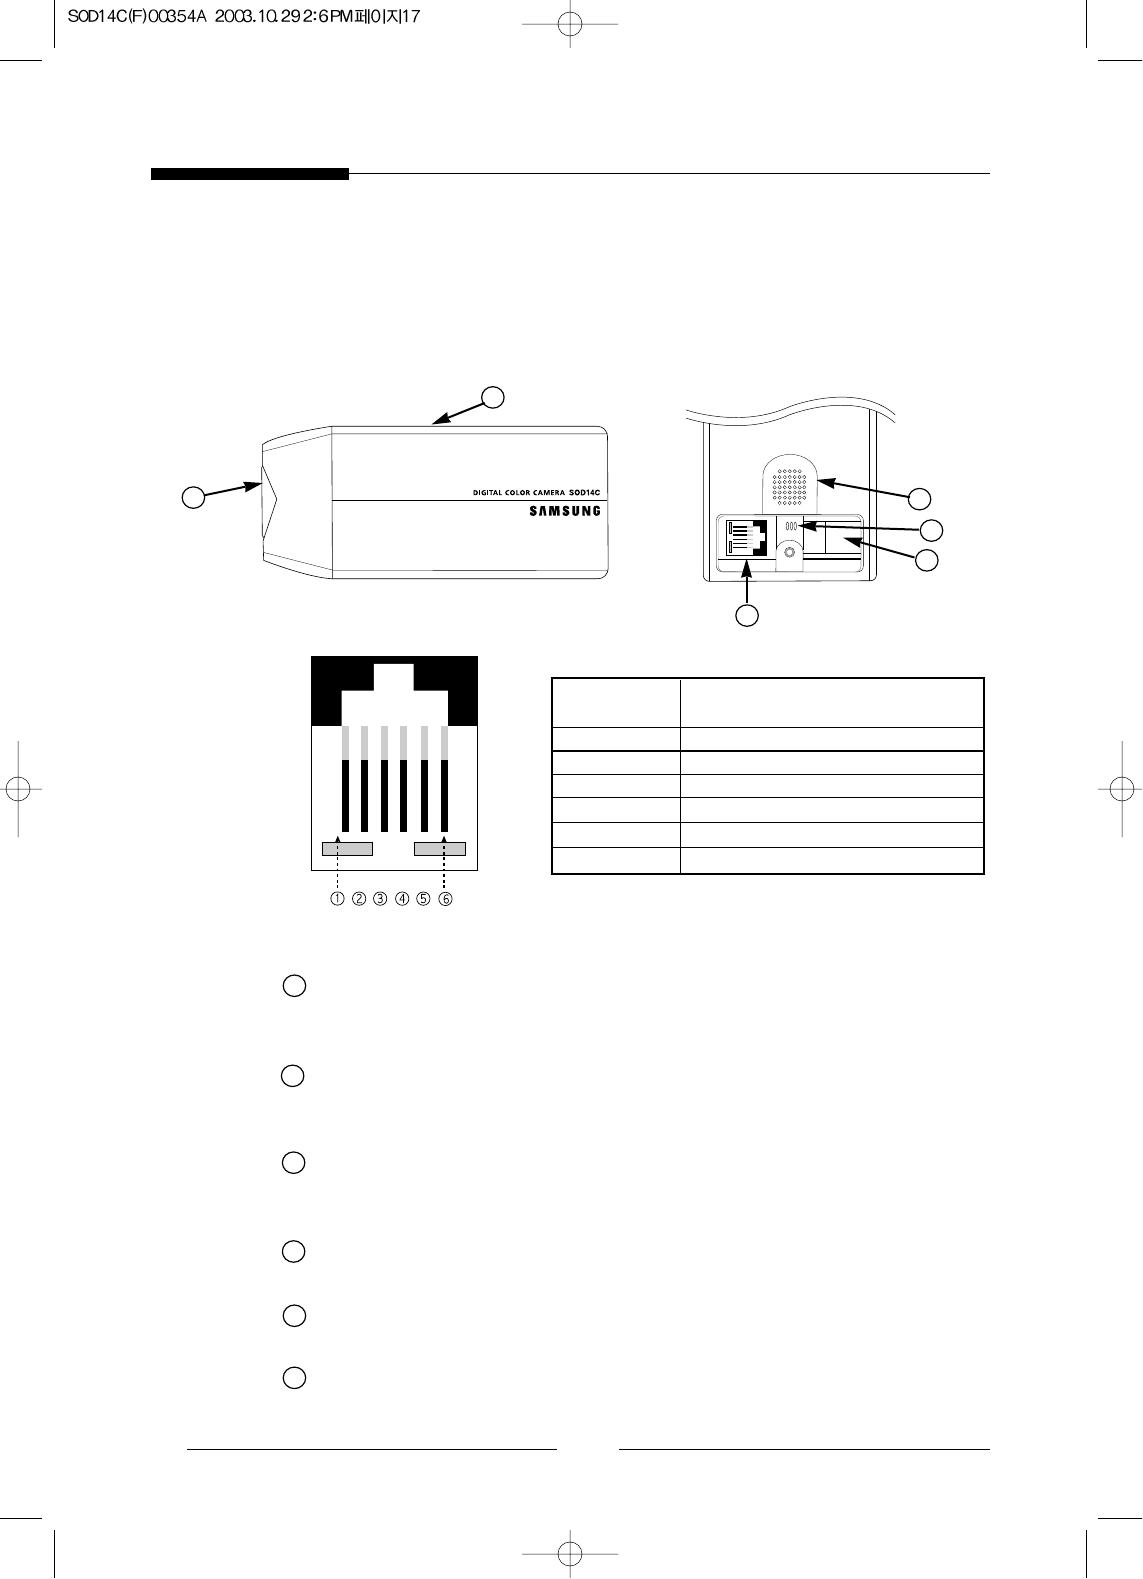 Samsung Sod14C Wiring Diagram from usermanual.wiki